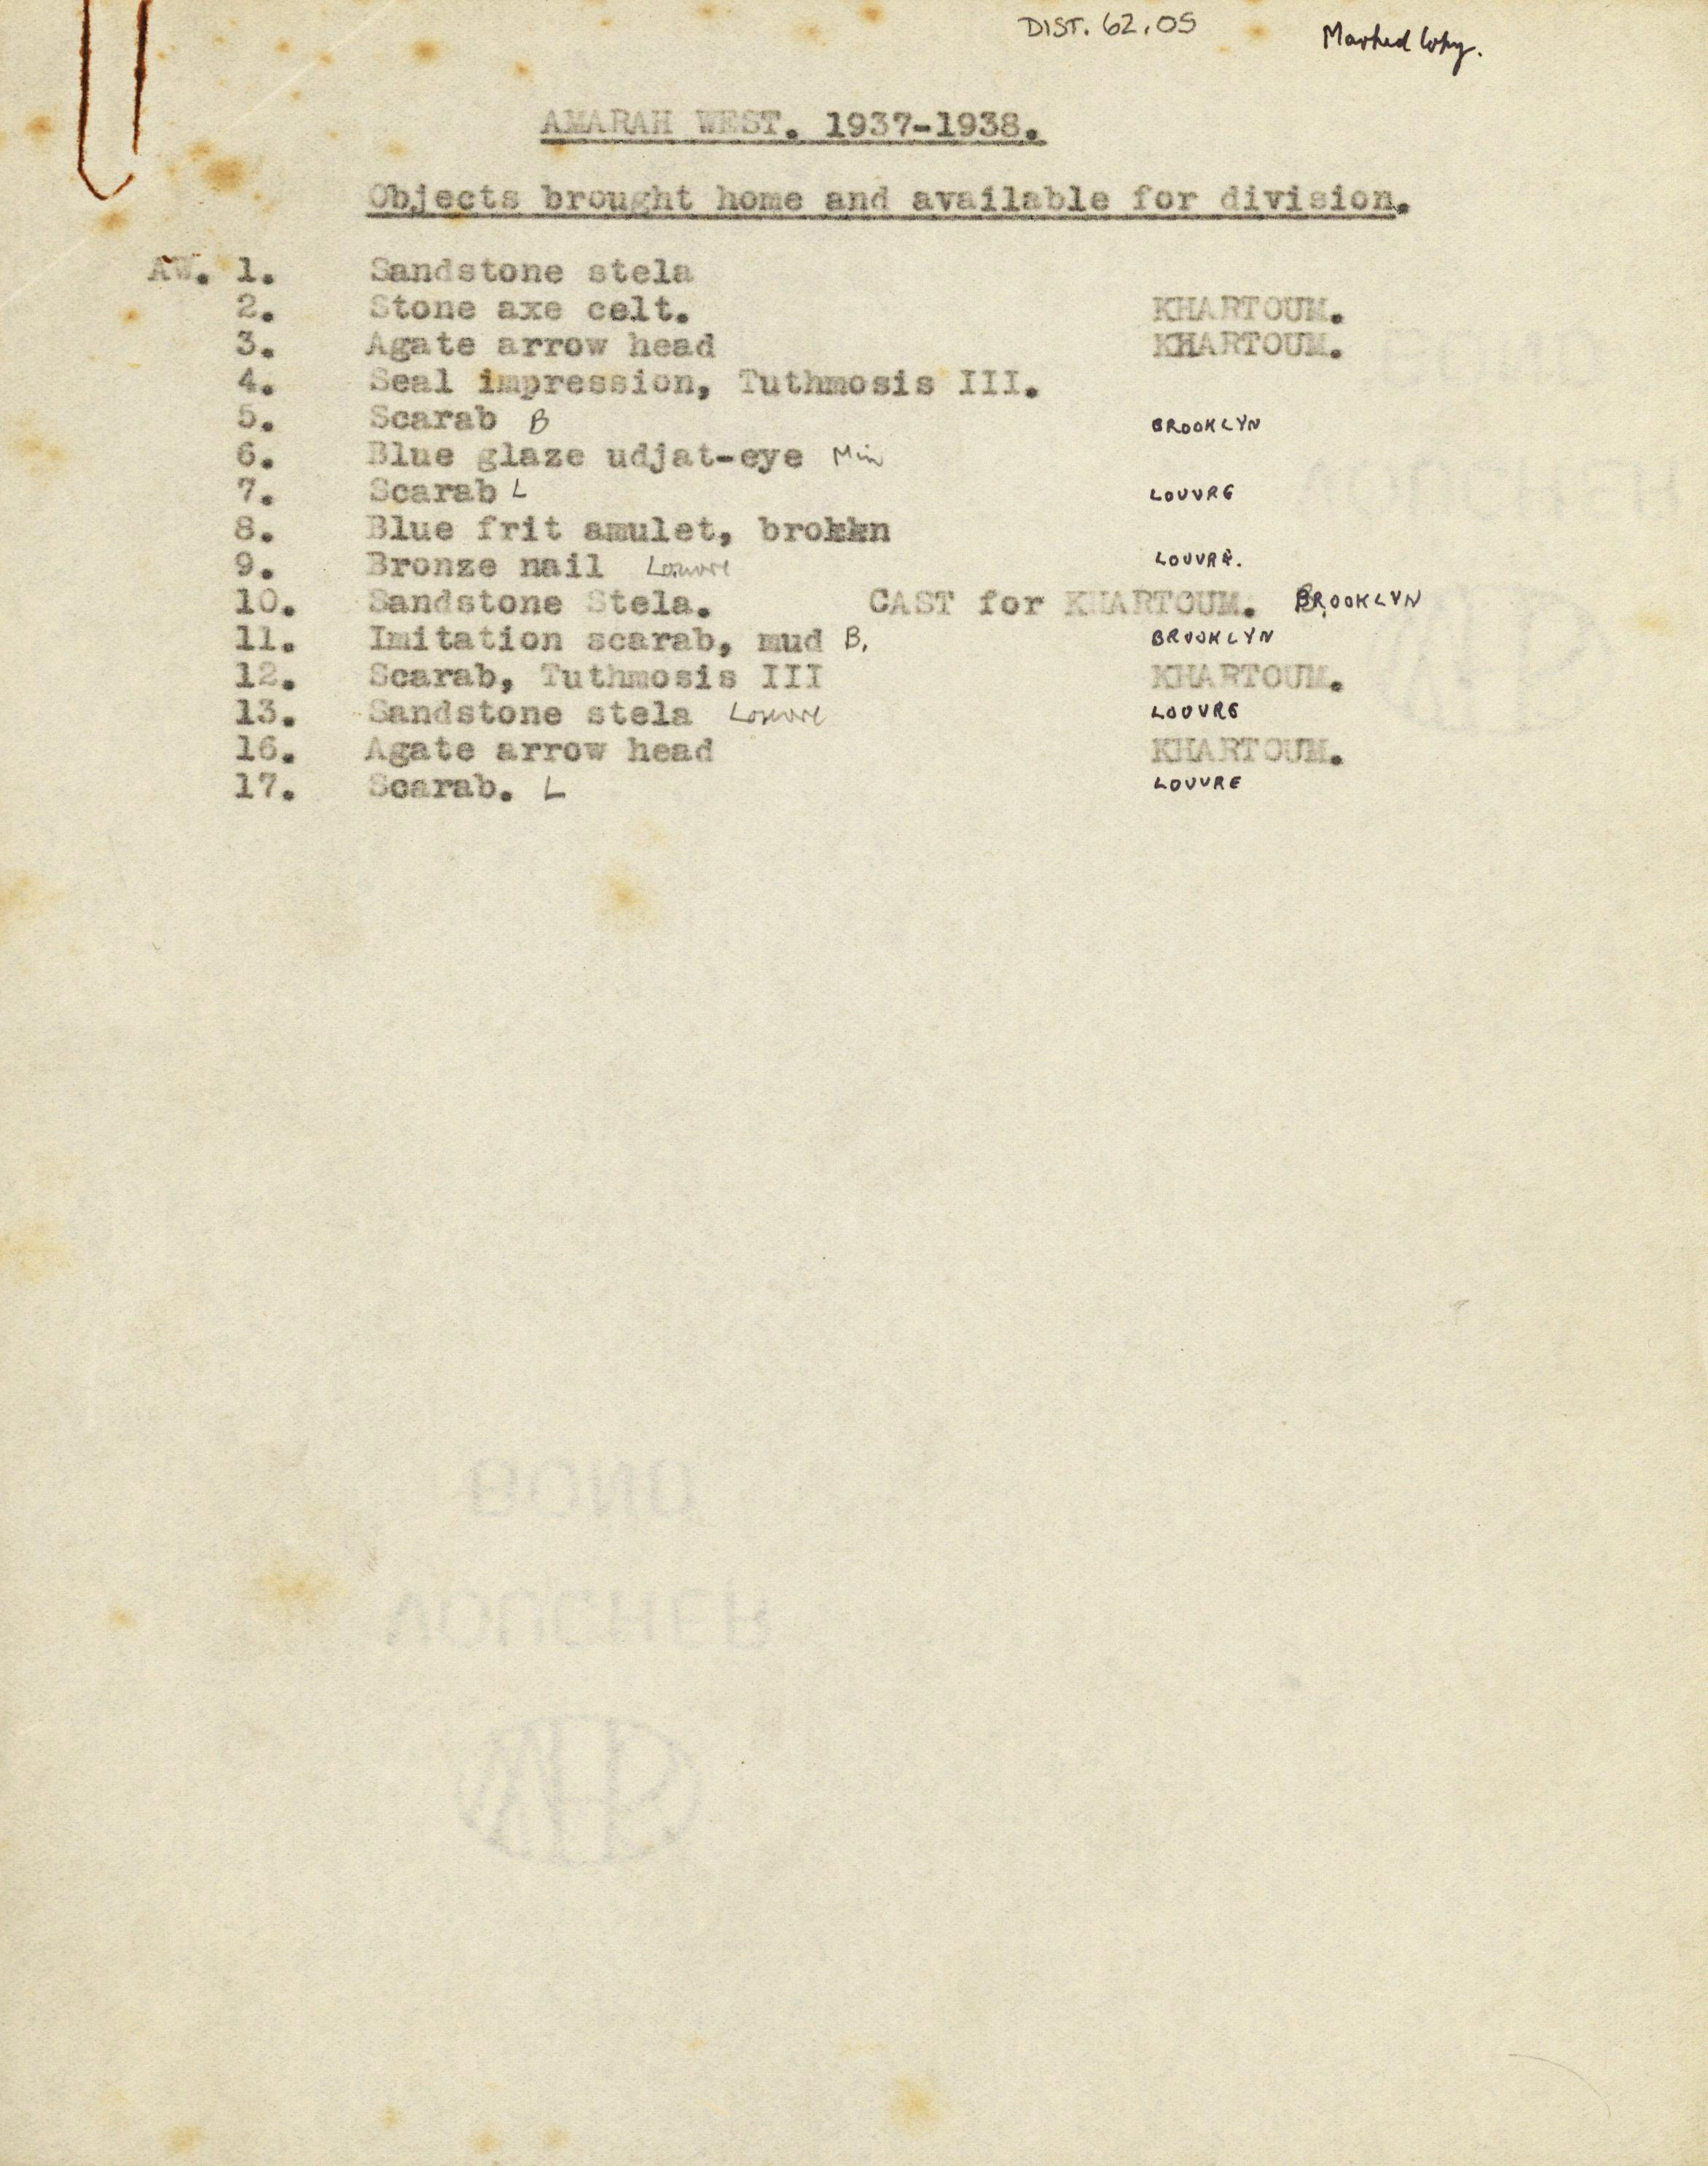 1936-38 Amarah West, Sesebi DIST.62.05